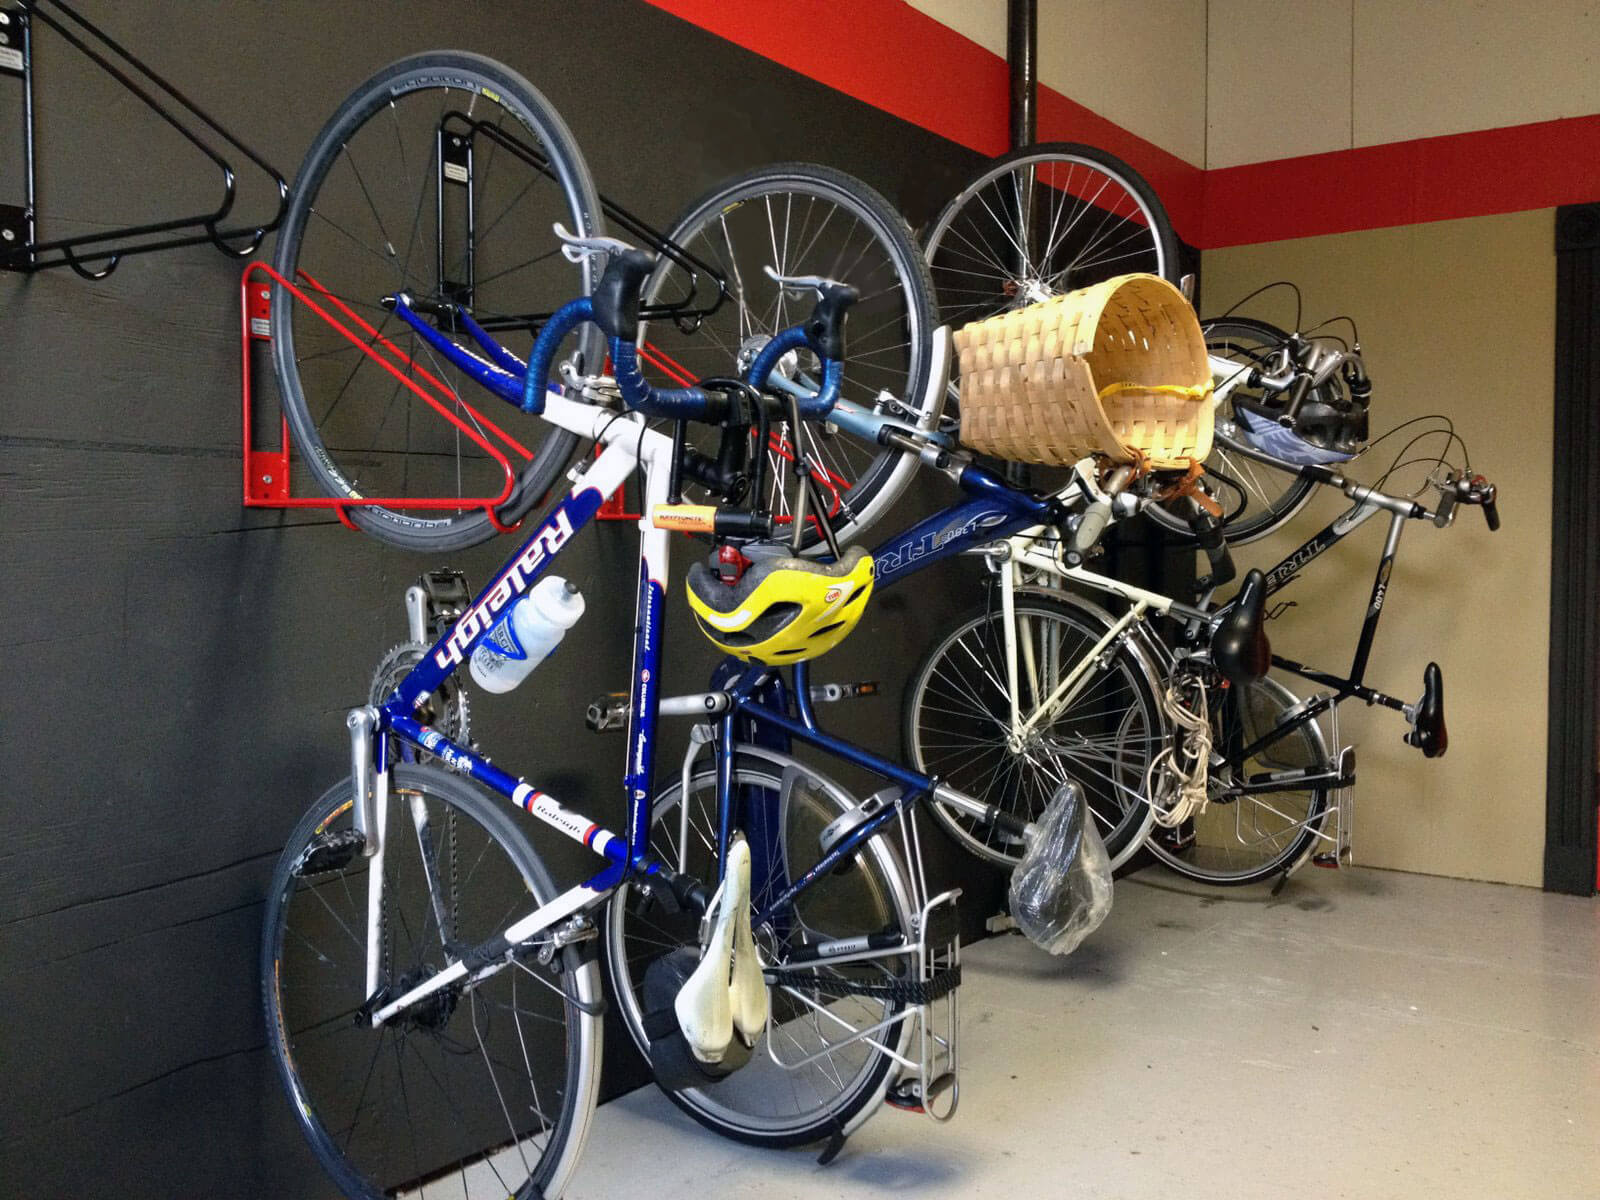 Bike Wall Rack Cyclesafe